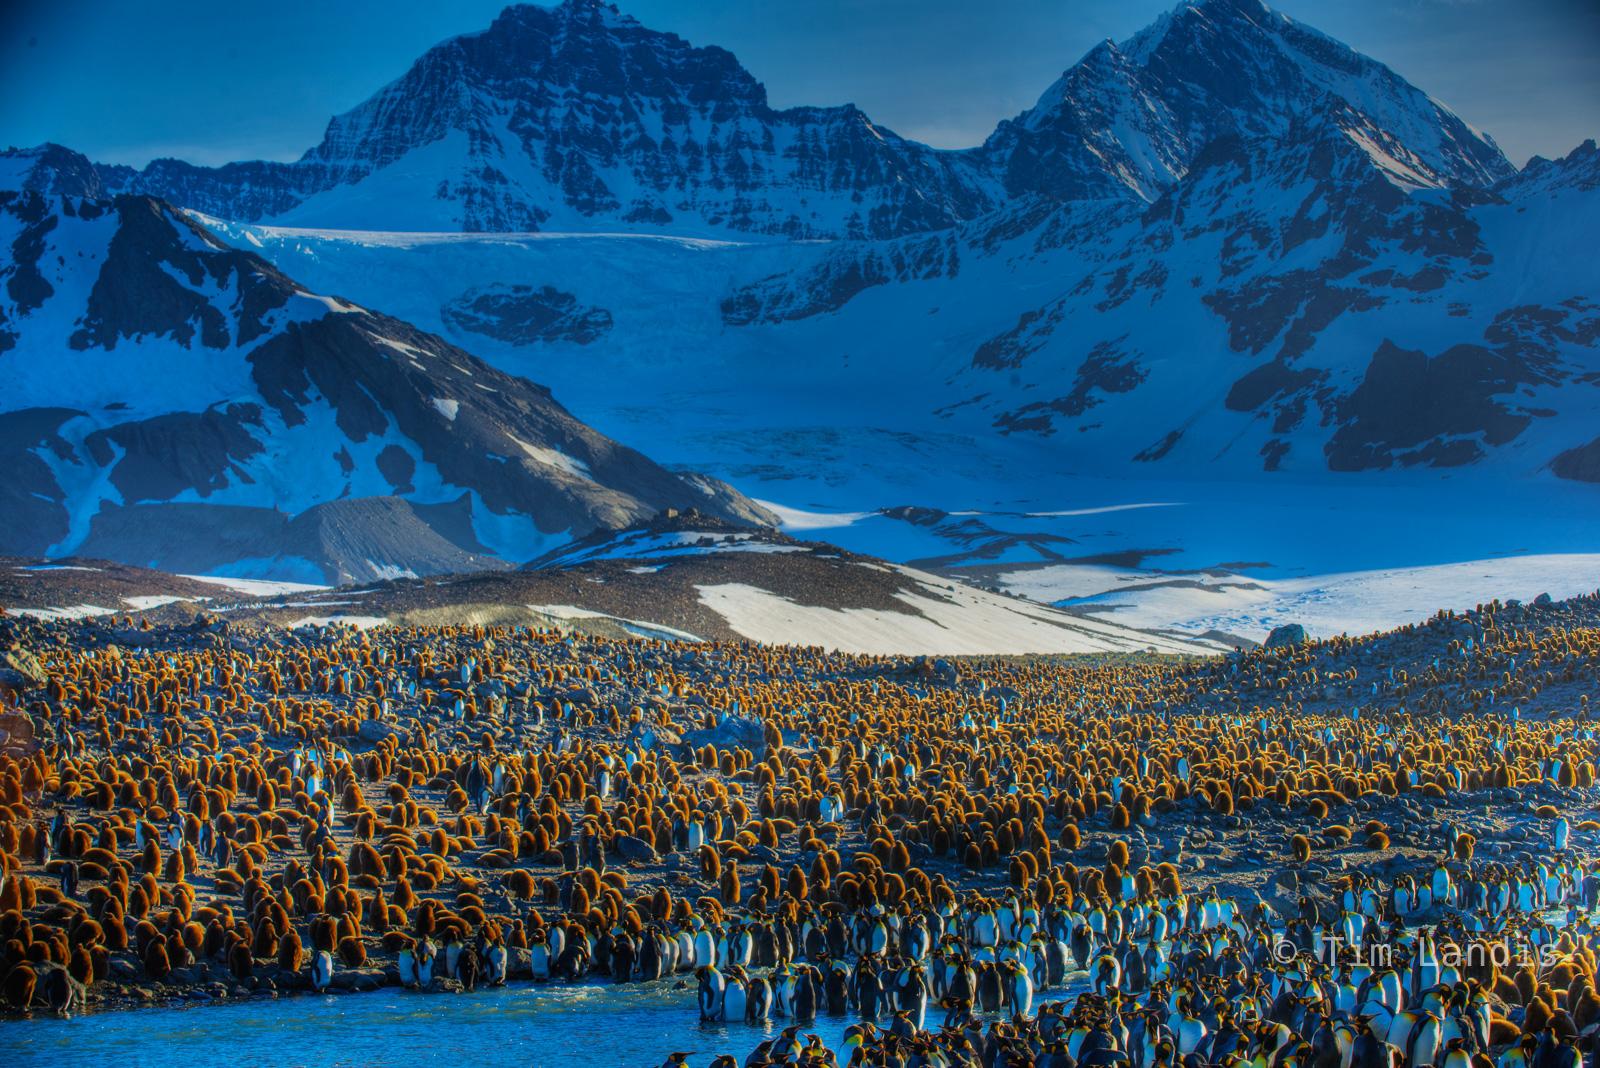 Baby King penguins., breeding grounds of S. Georgia Islands, brown woolies, photo